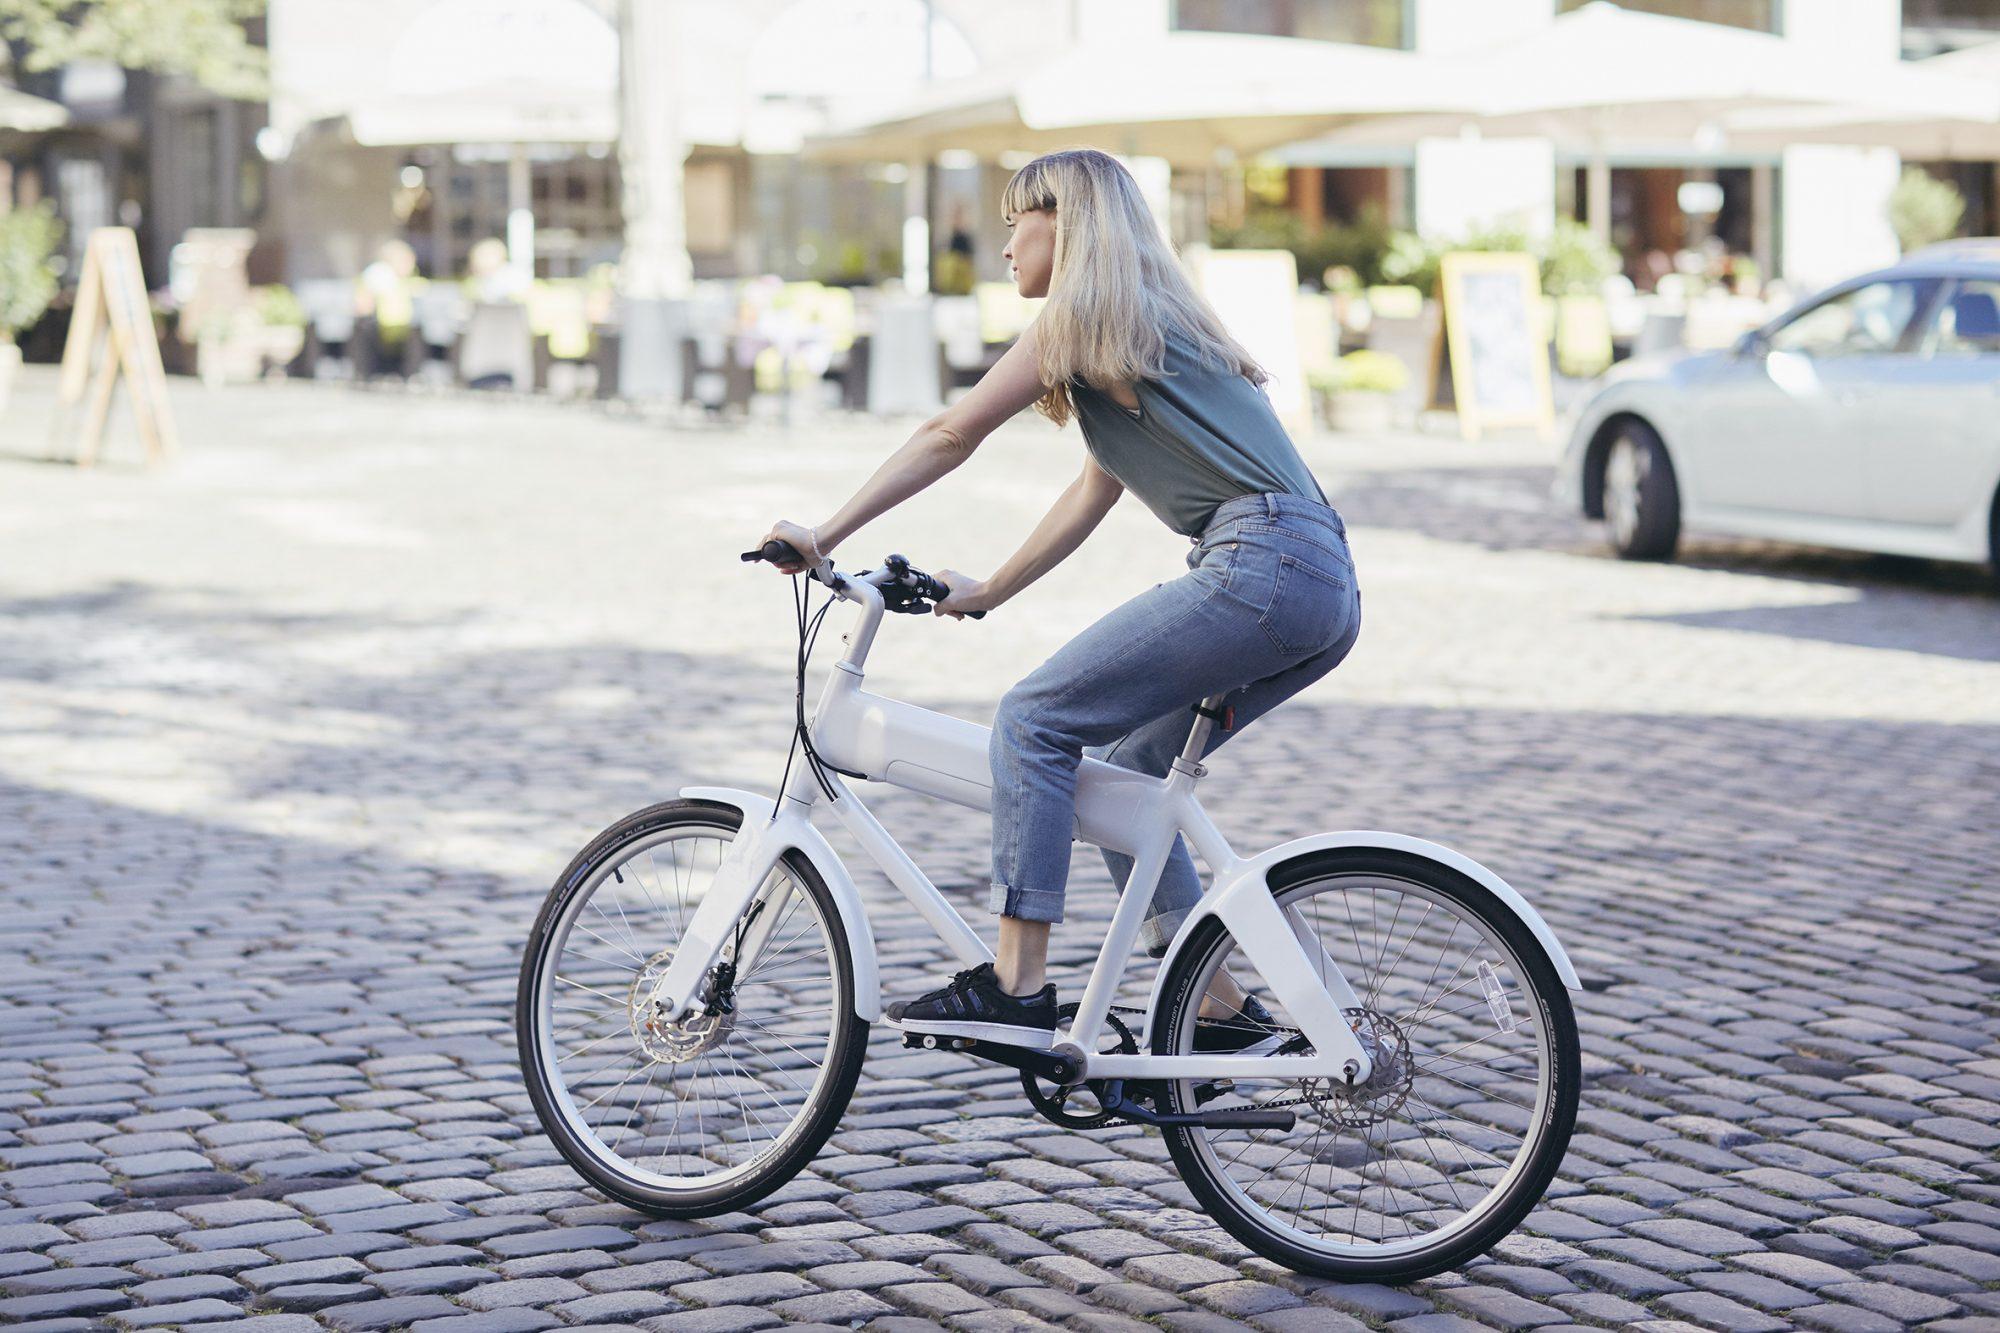 Biomega OKO with rider